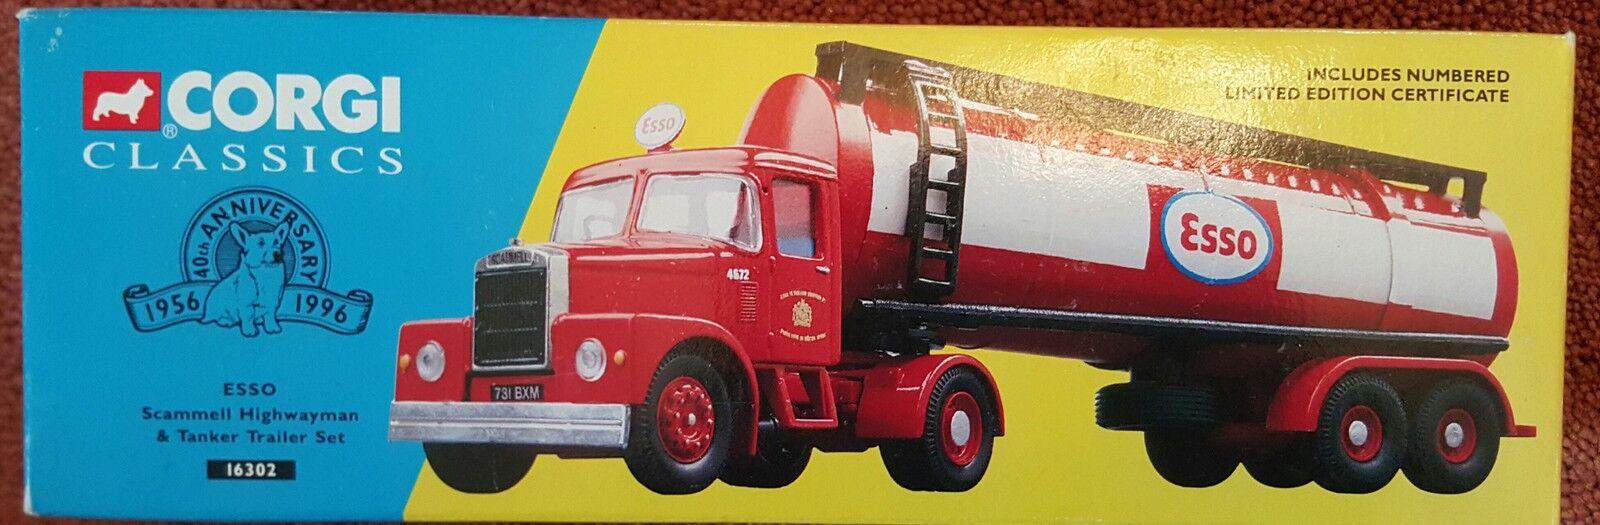 Corgi Classics ESSO Scammell Highwayman & Tanker Set 16302